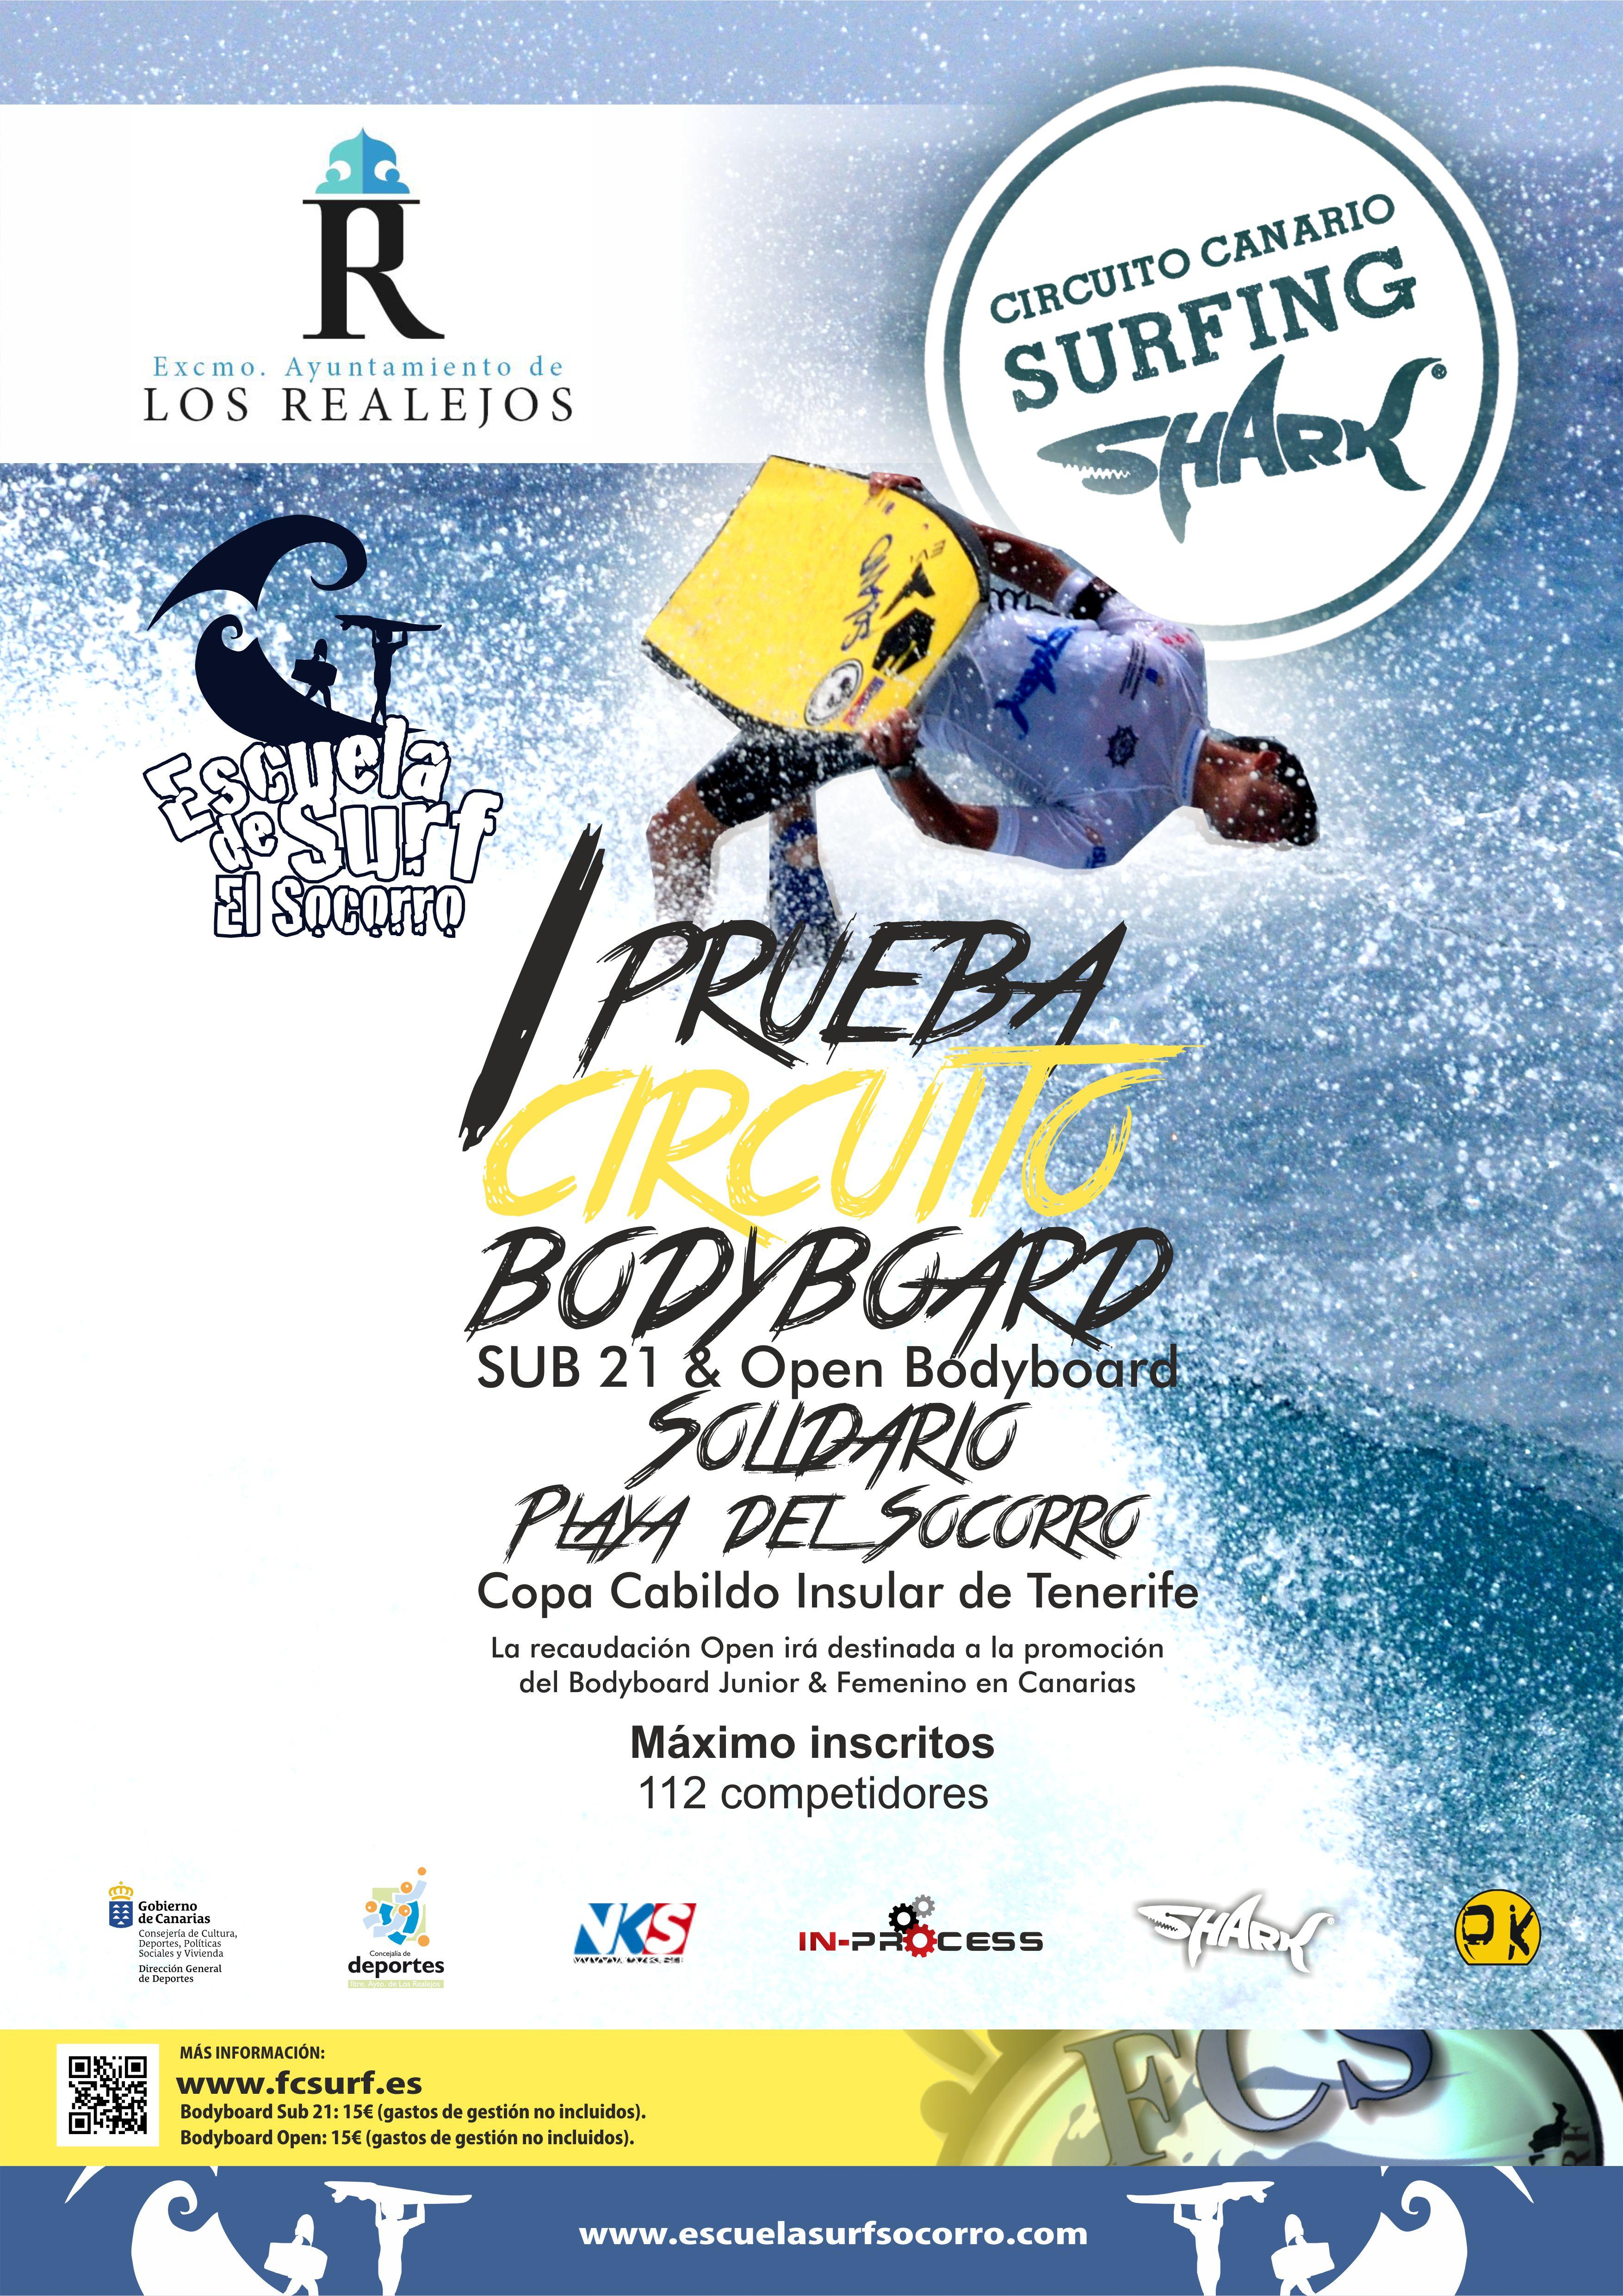 I PRUEBA CIRCUITO CANARIO DE SURFING SHARK-BODYBOARD SUB 21 - Inskriba zaitez